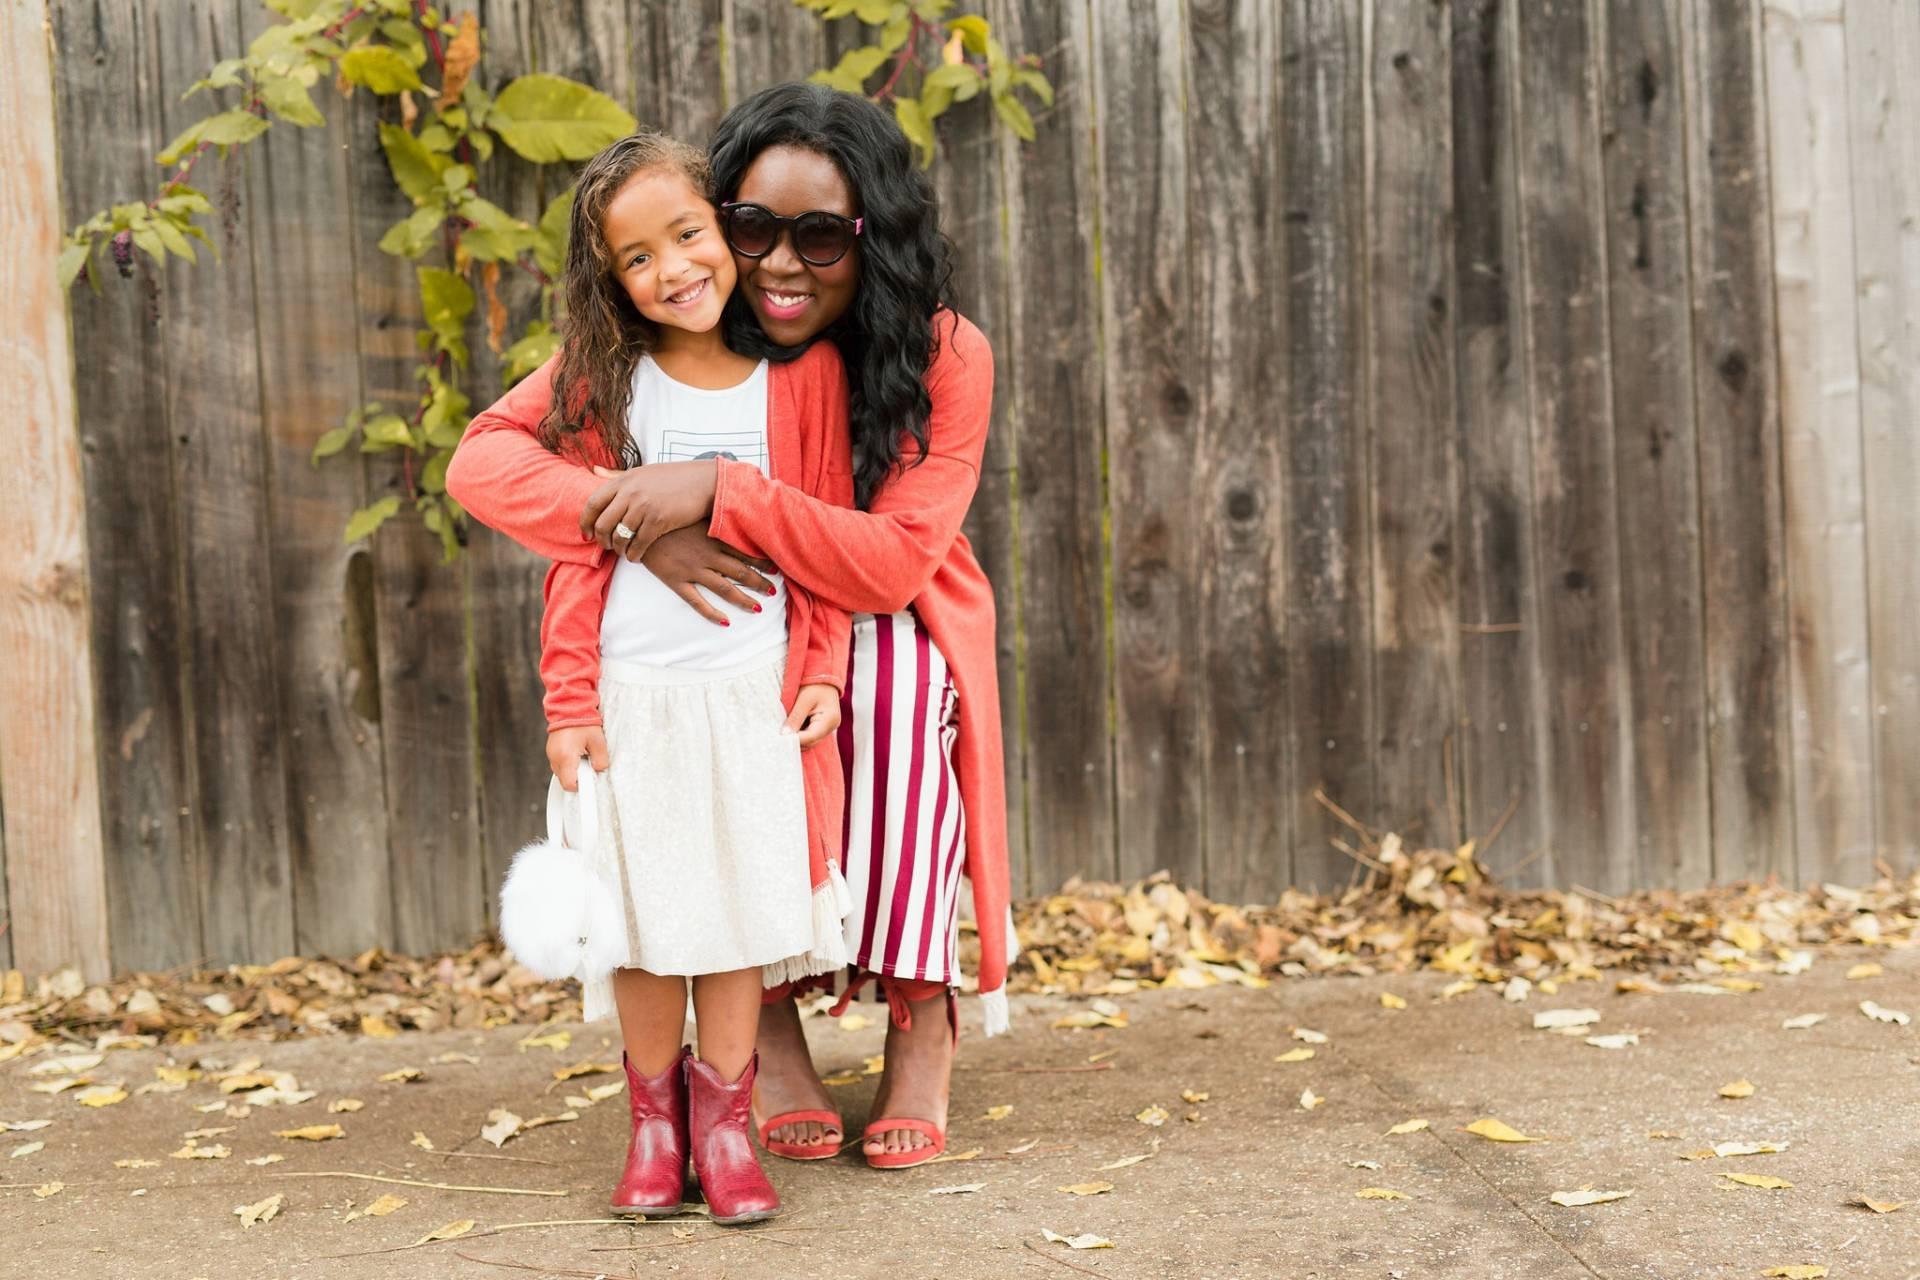 Nigerian dating sites sokerin daddies